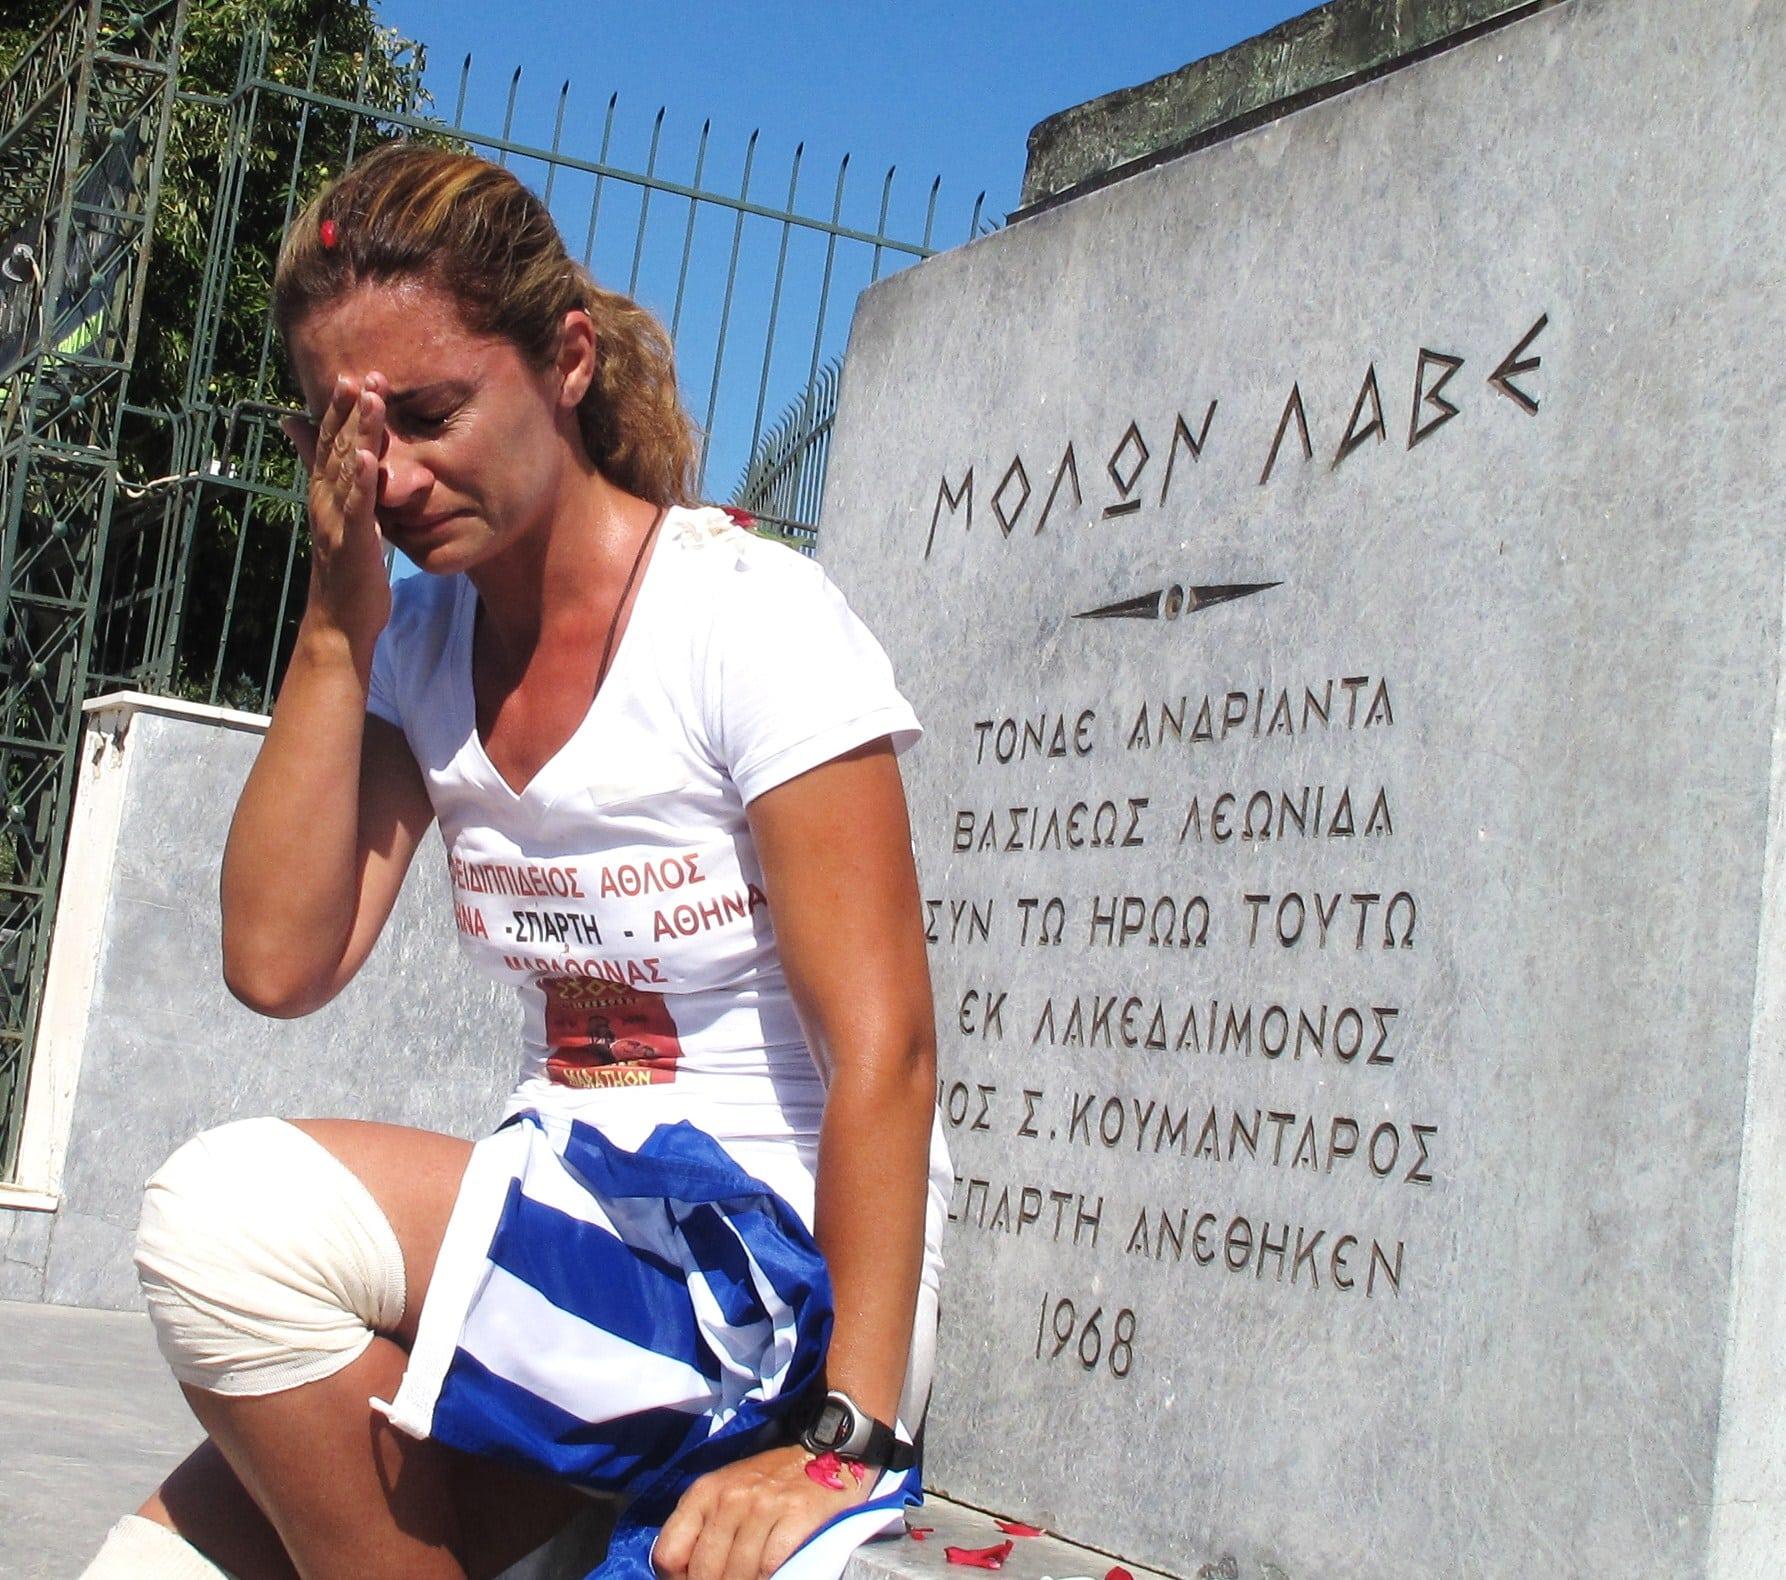 H στιγμή του τερματισμού της Μαρίας Πολύζου μετά από 524 Km